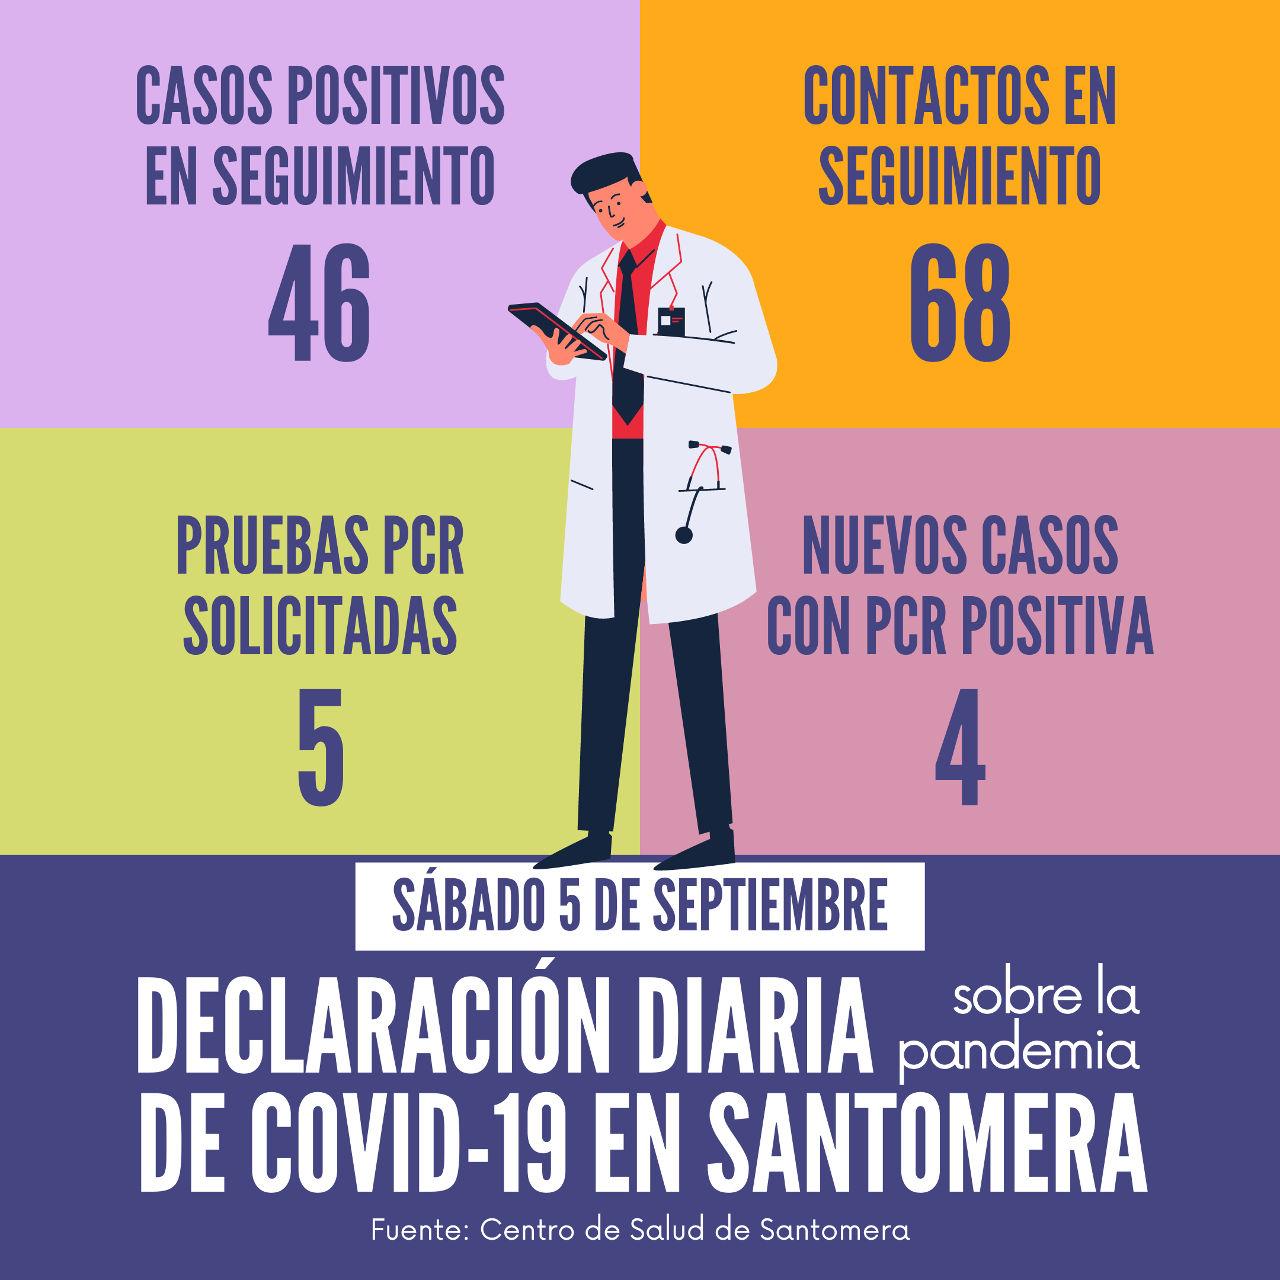 20200905_Datos COVID-19 Santomera